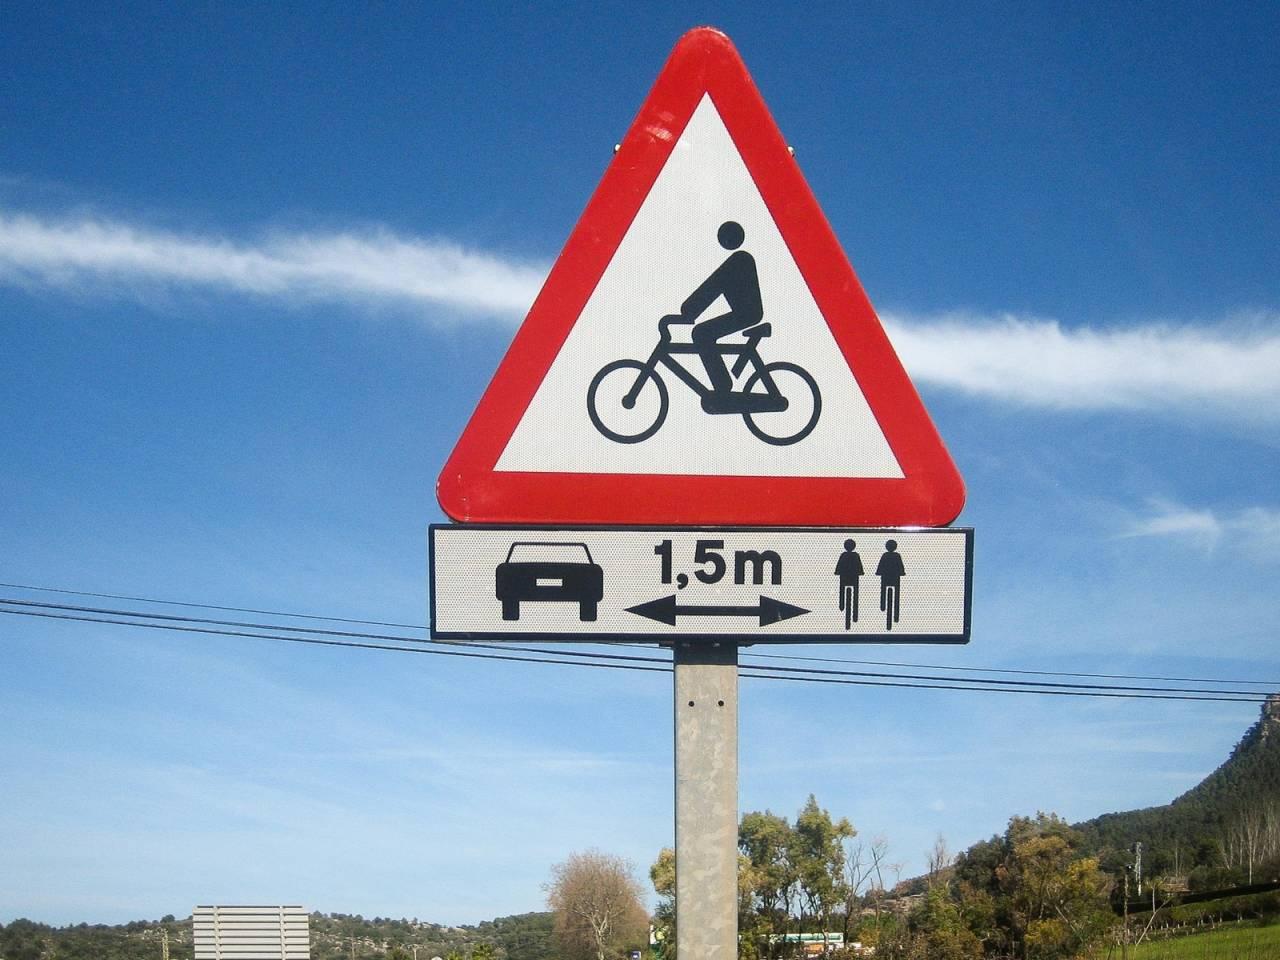 passering syklister